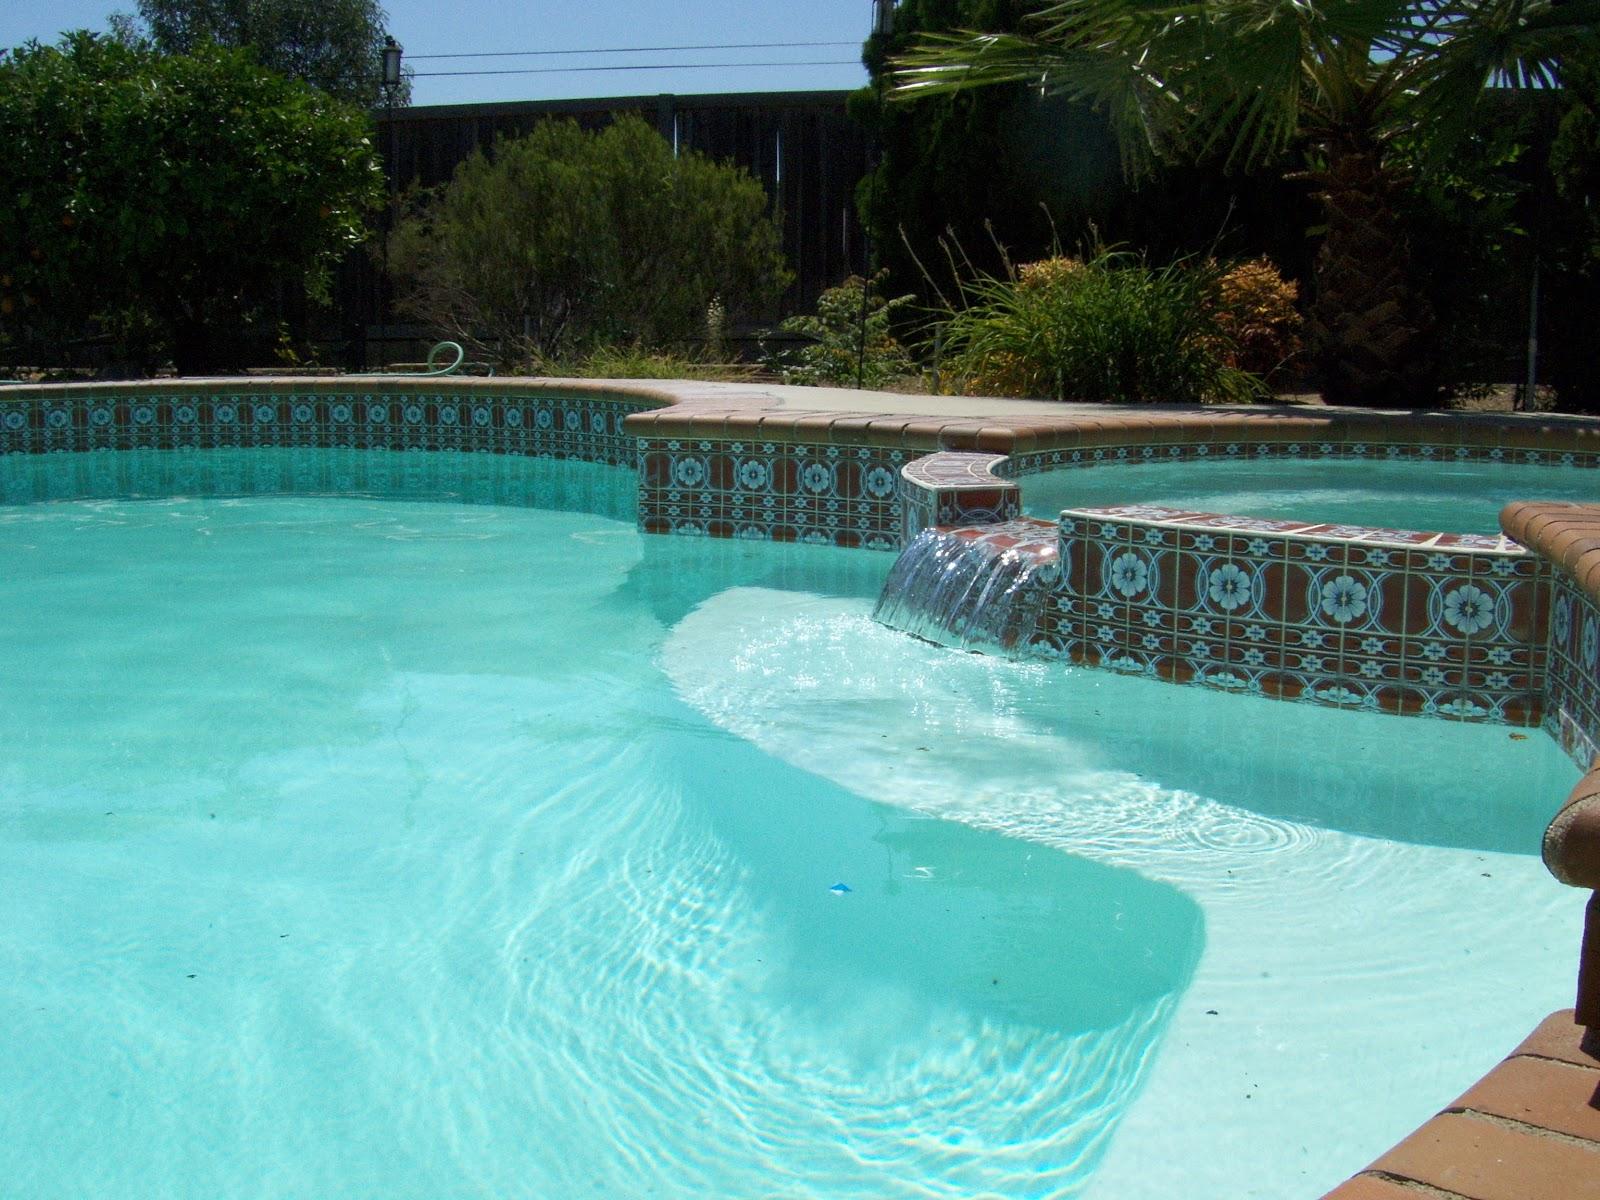 Pool Tile Cleaning Pro 877 835 8763 Orange County Los Angeles Riverside Palm Springs Pool Tile